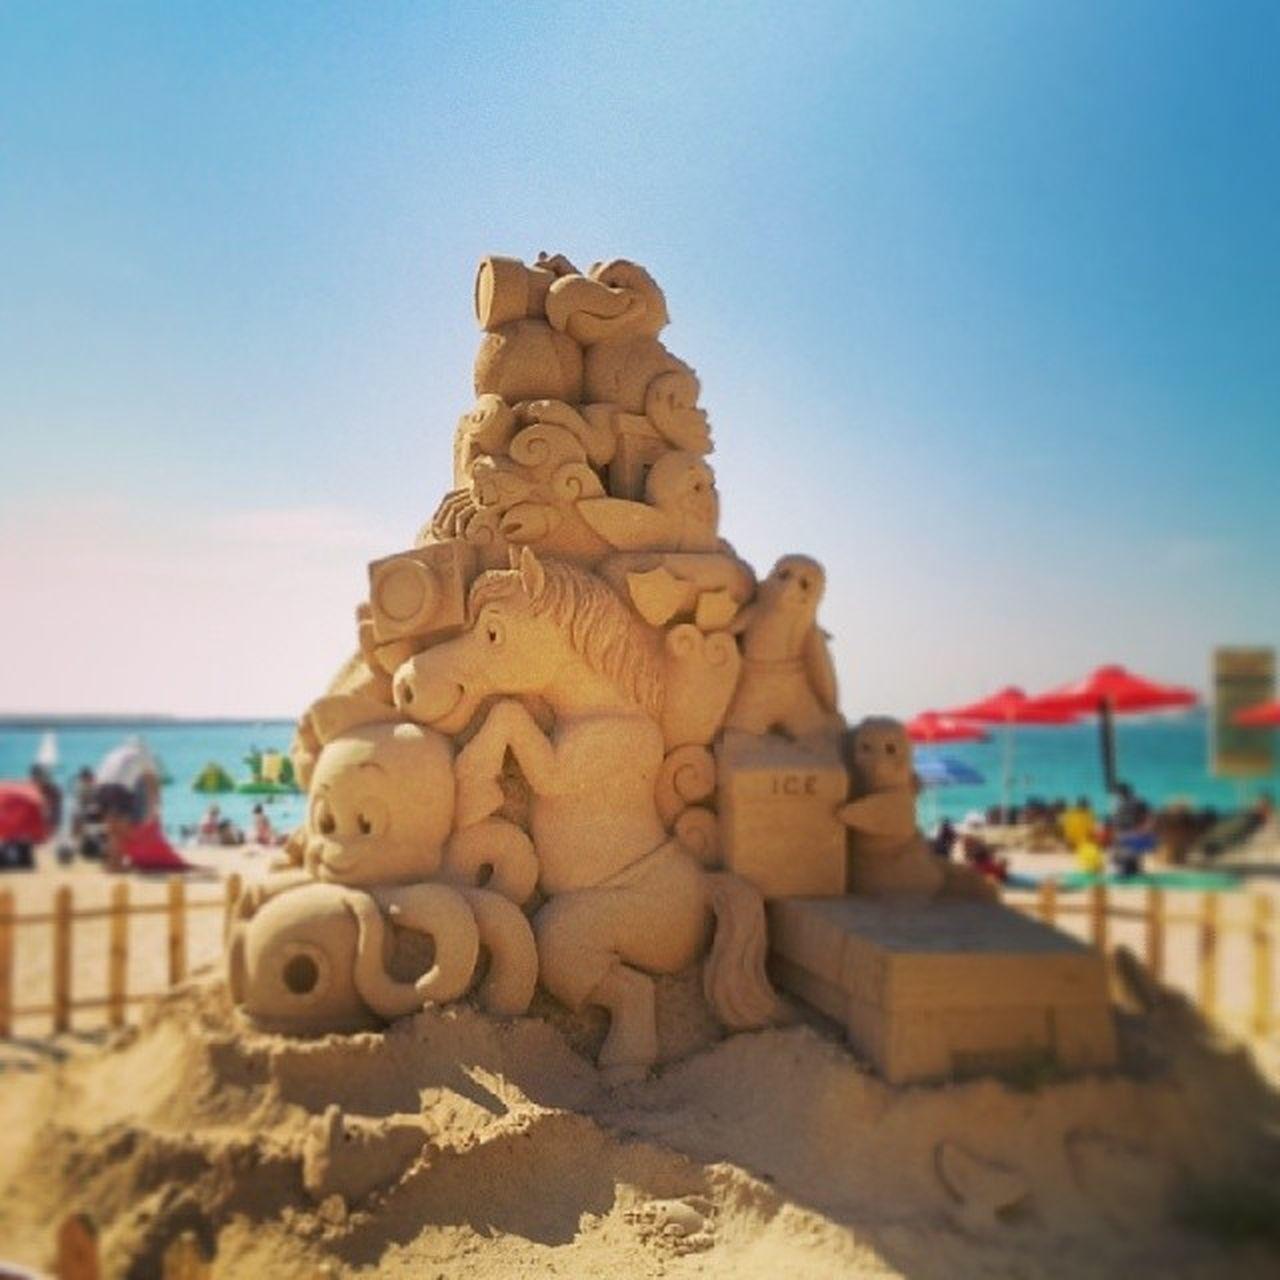 Sand sculpture in Jbr Dubai